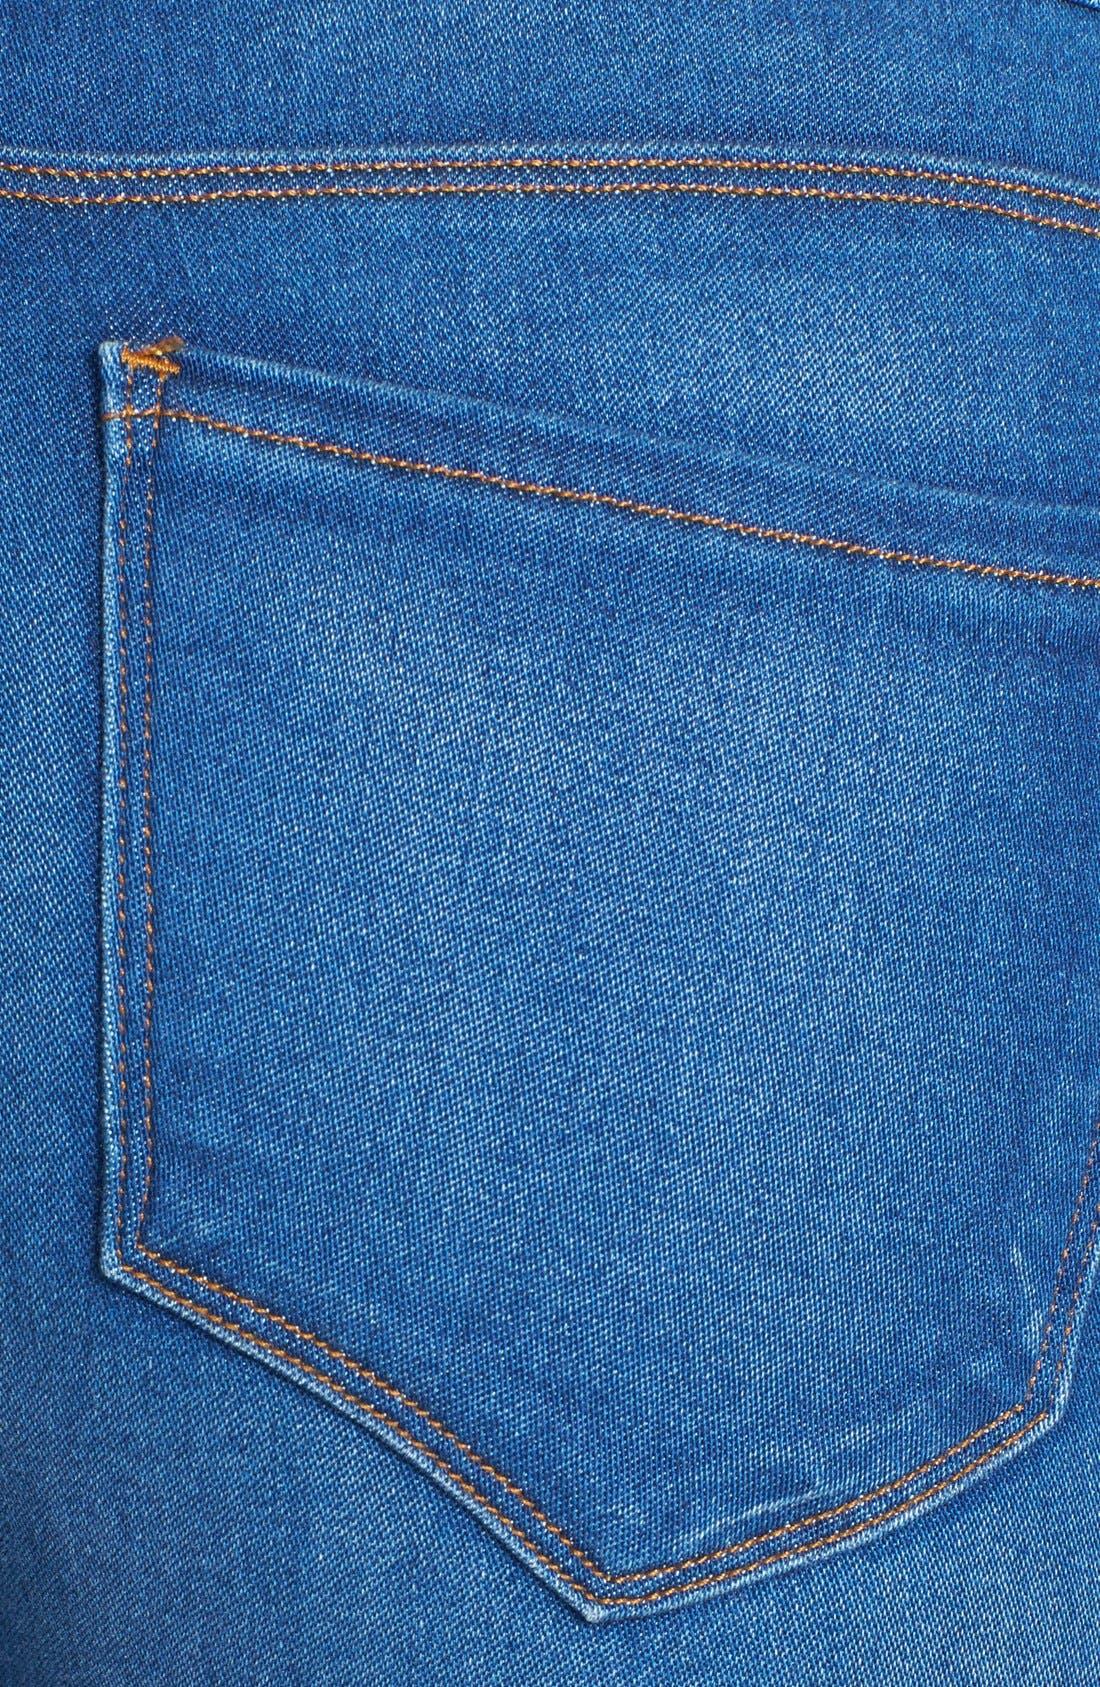 Alternate Image 3  - Genetic 'Shya' Cigarette Skinny Jeans (Impact)